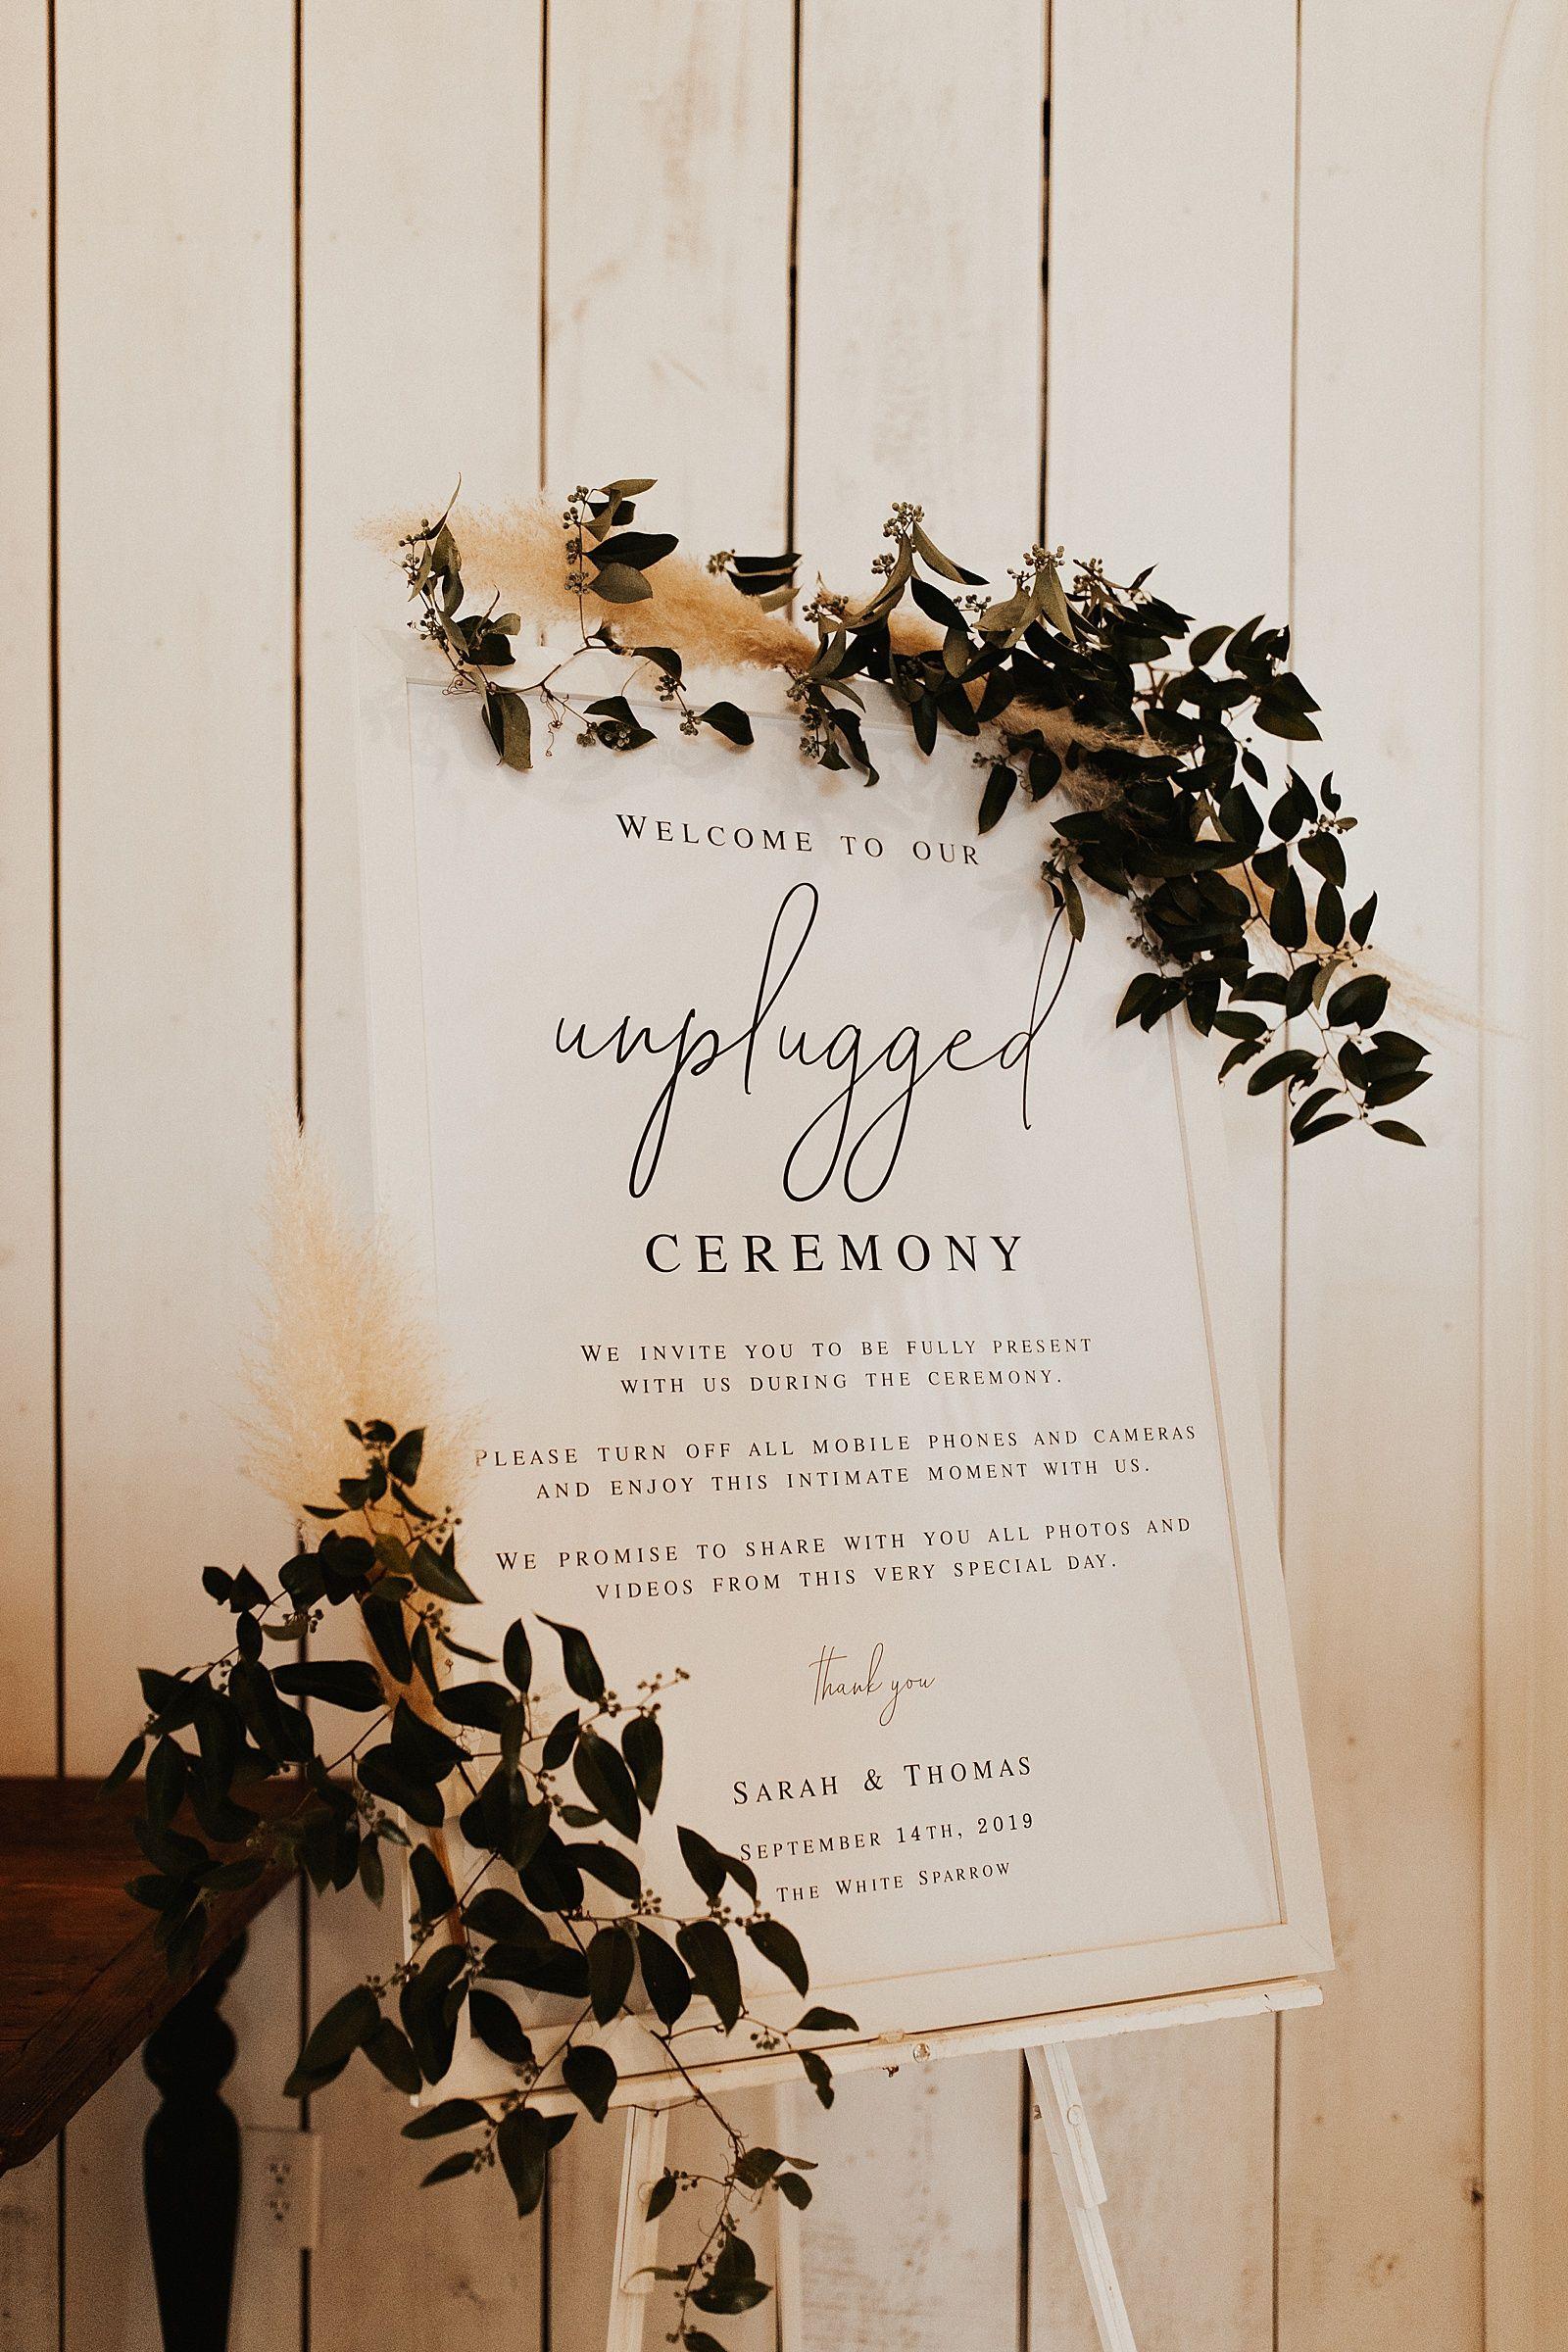 White Sparrow Barn Wedding in Dallas, TX | Thomas + Sarah - Meg Amorette Photography